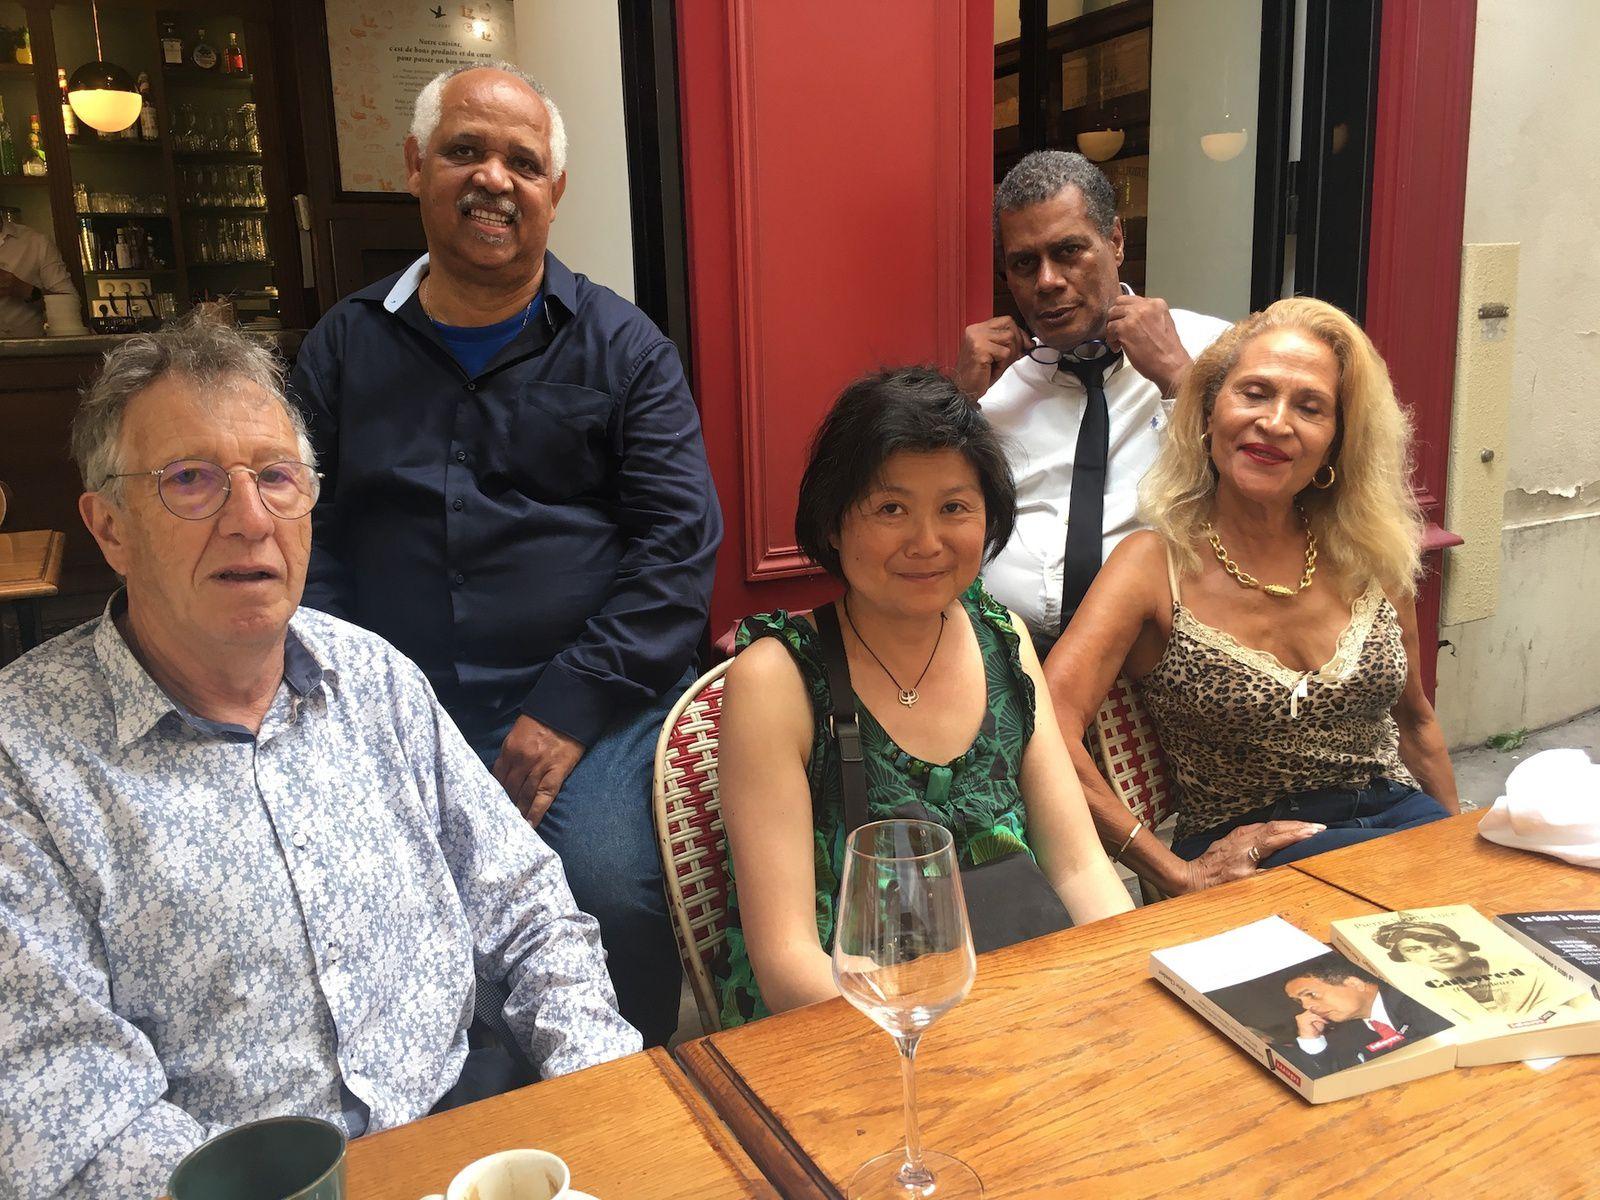 Pierre Chambert, René Bélénus, Thanh-van Ton-that, Jean-Benoît Desnel et Suzanne Dracius